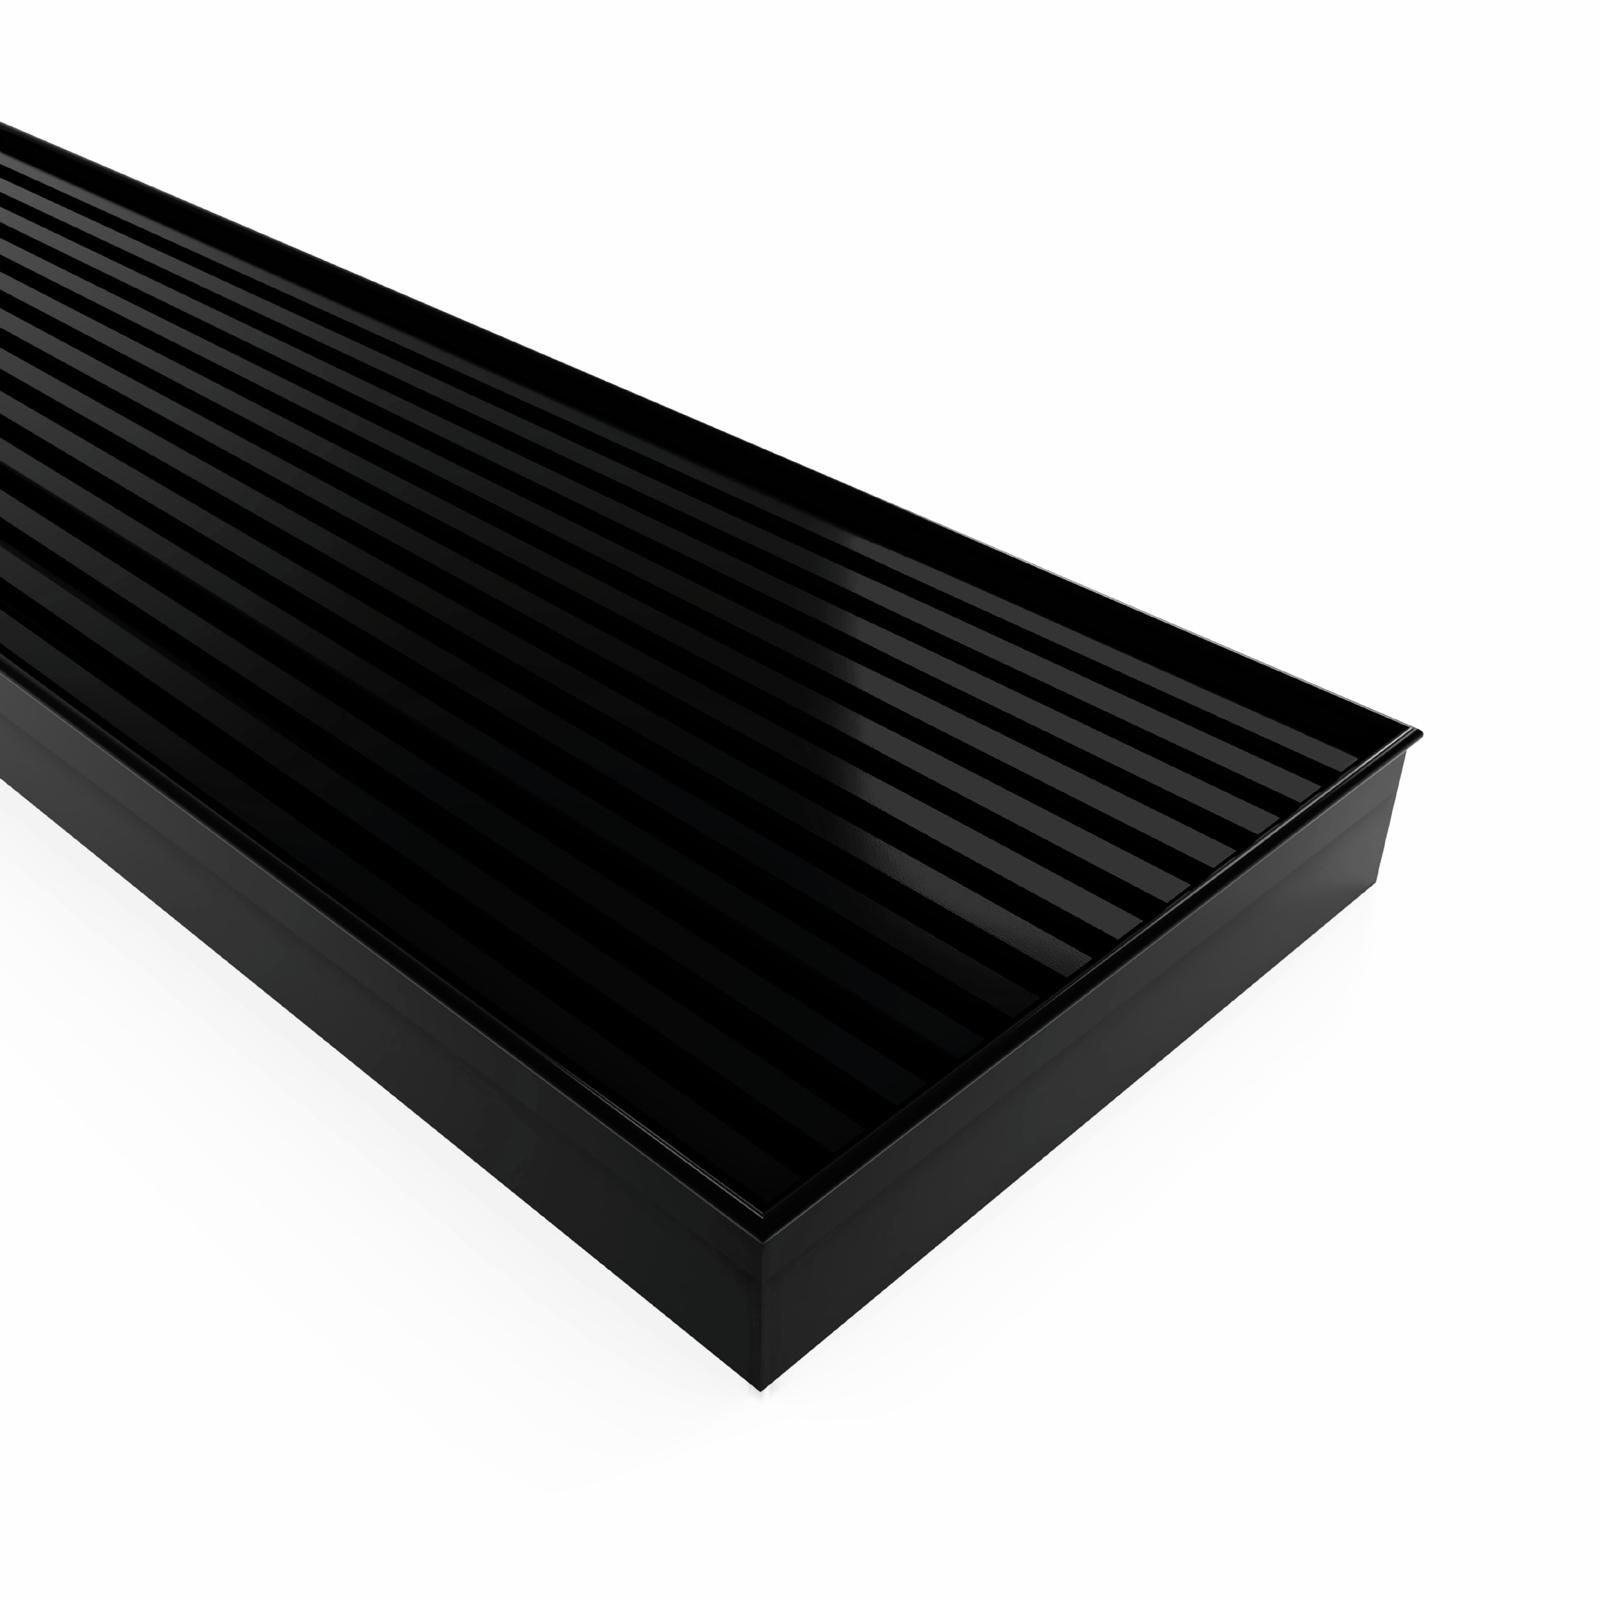 Forme  900 × 100 mm Black Satin Stainless Steel Mesh Floor Waste